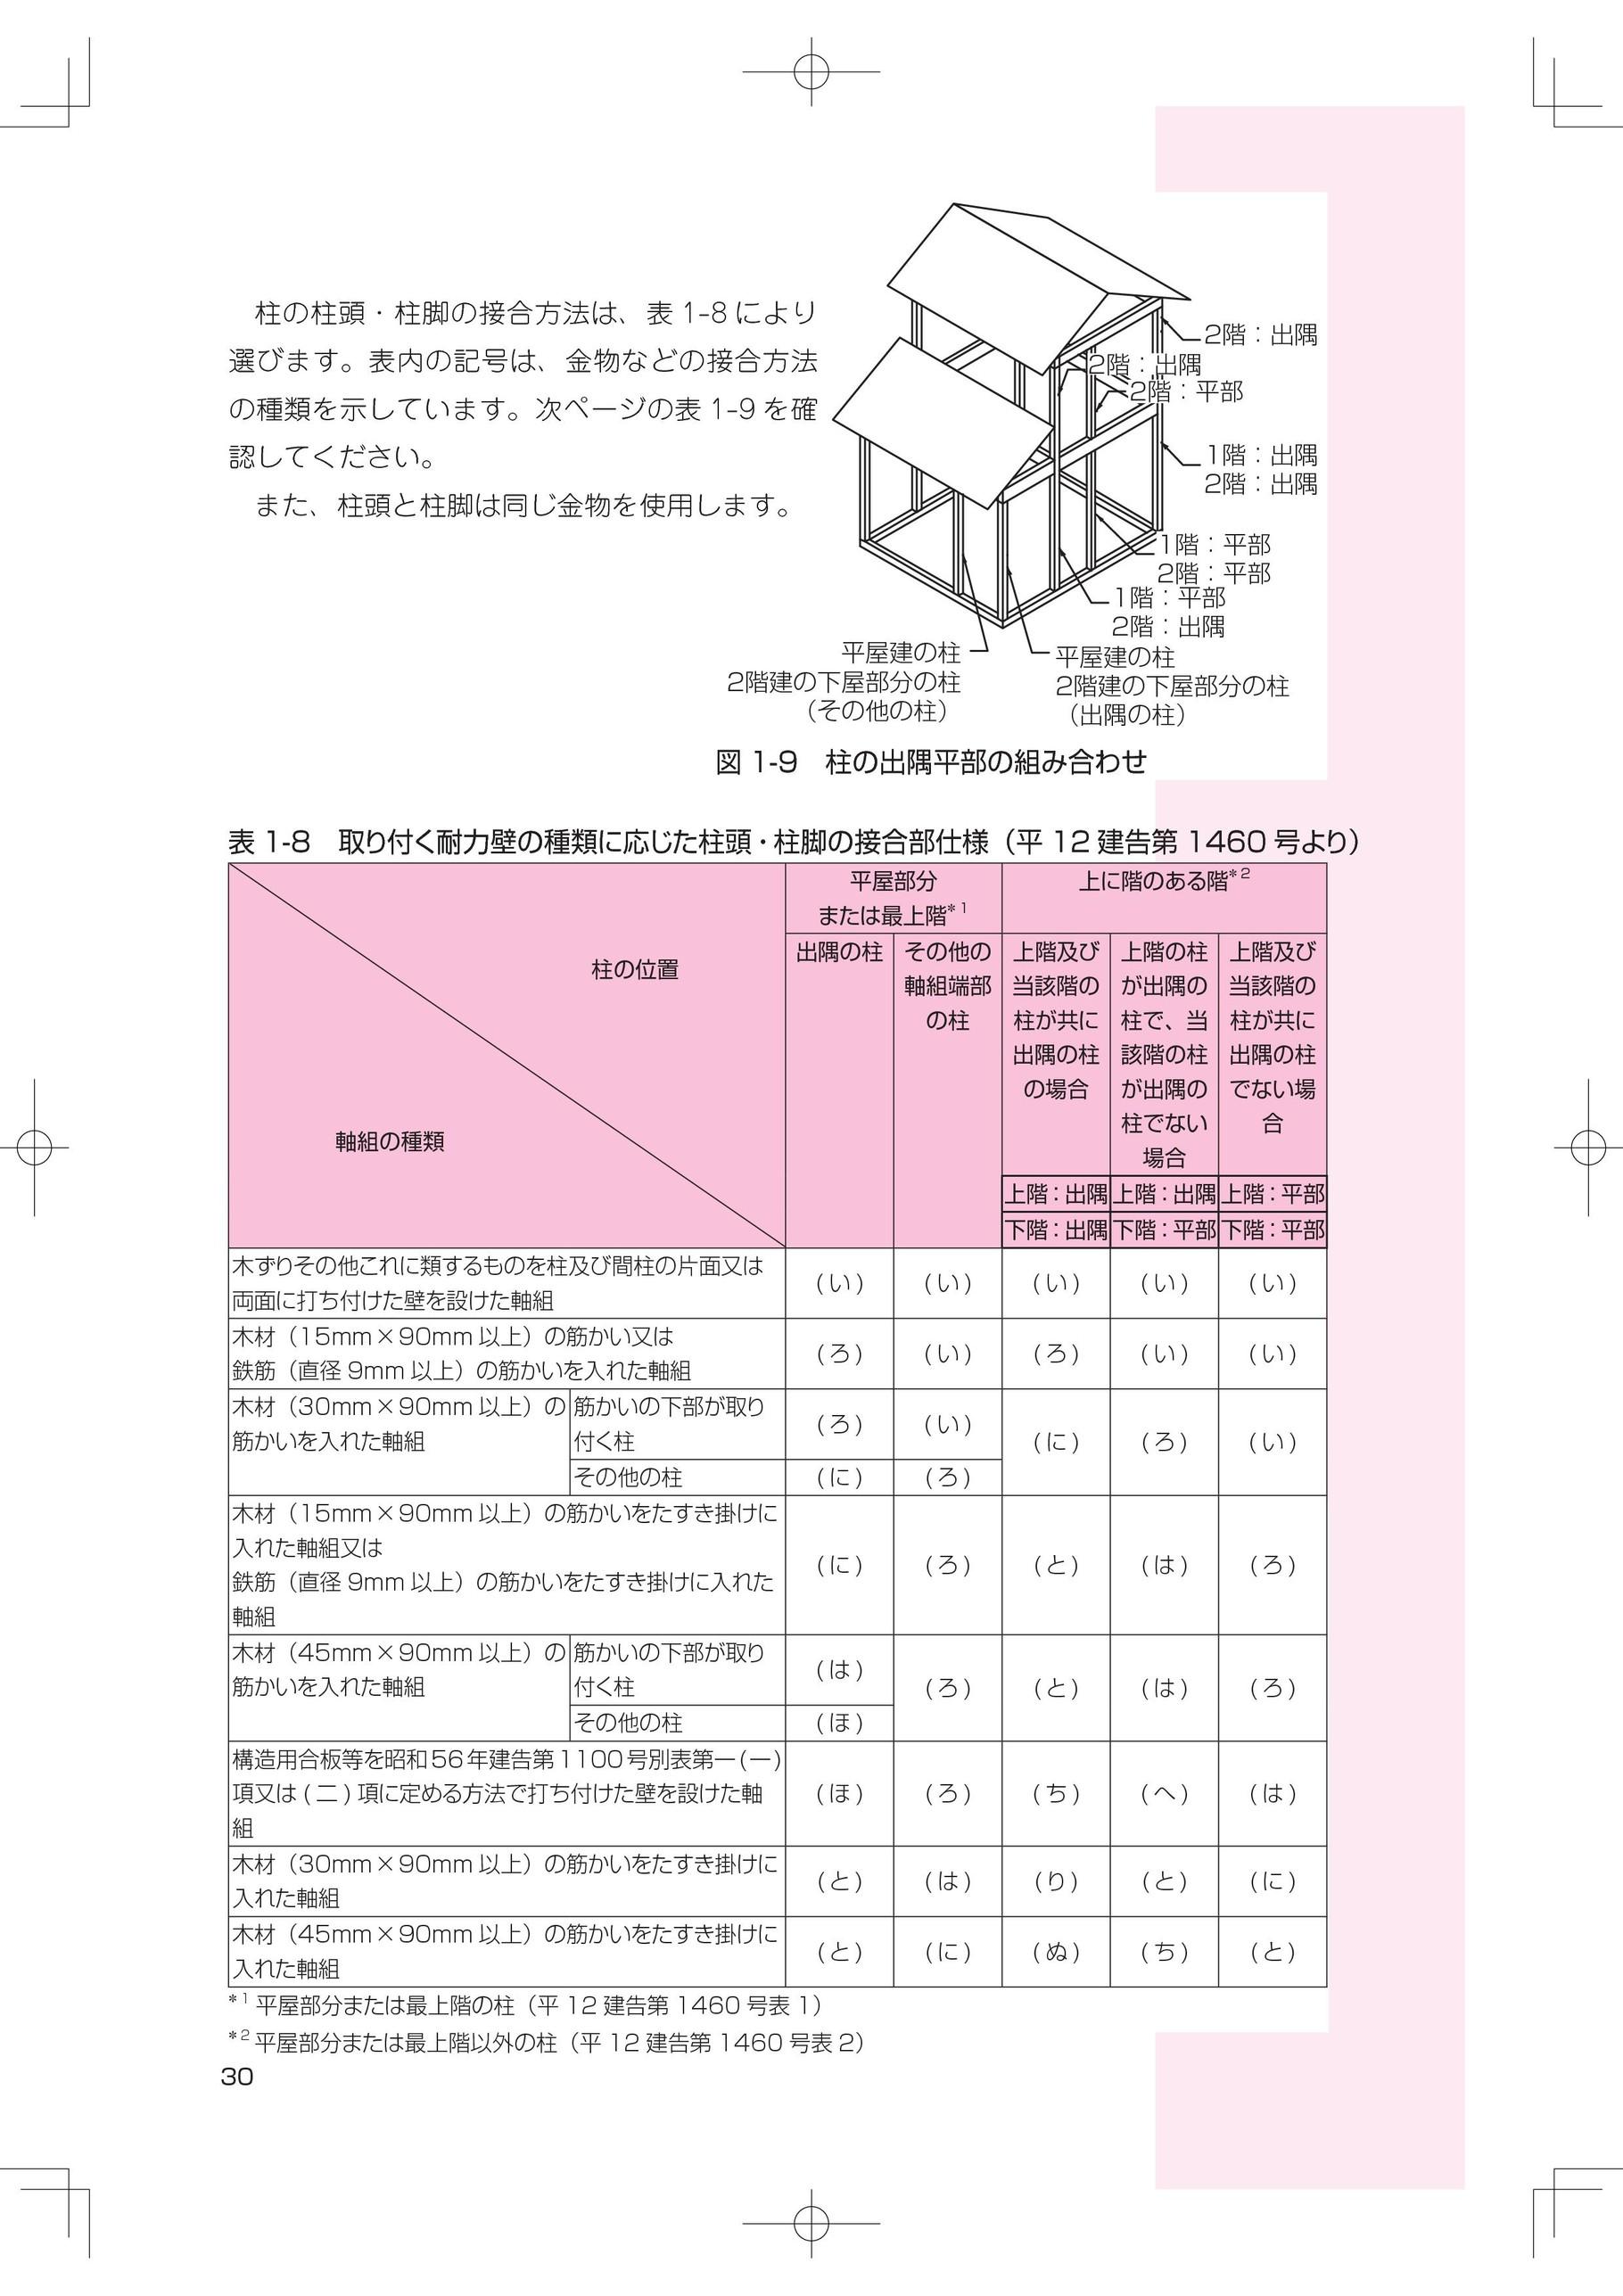 H12建設省告示1460号による柱頭柱脚接合部の仕様の際の注意点